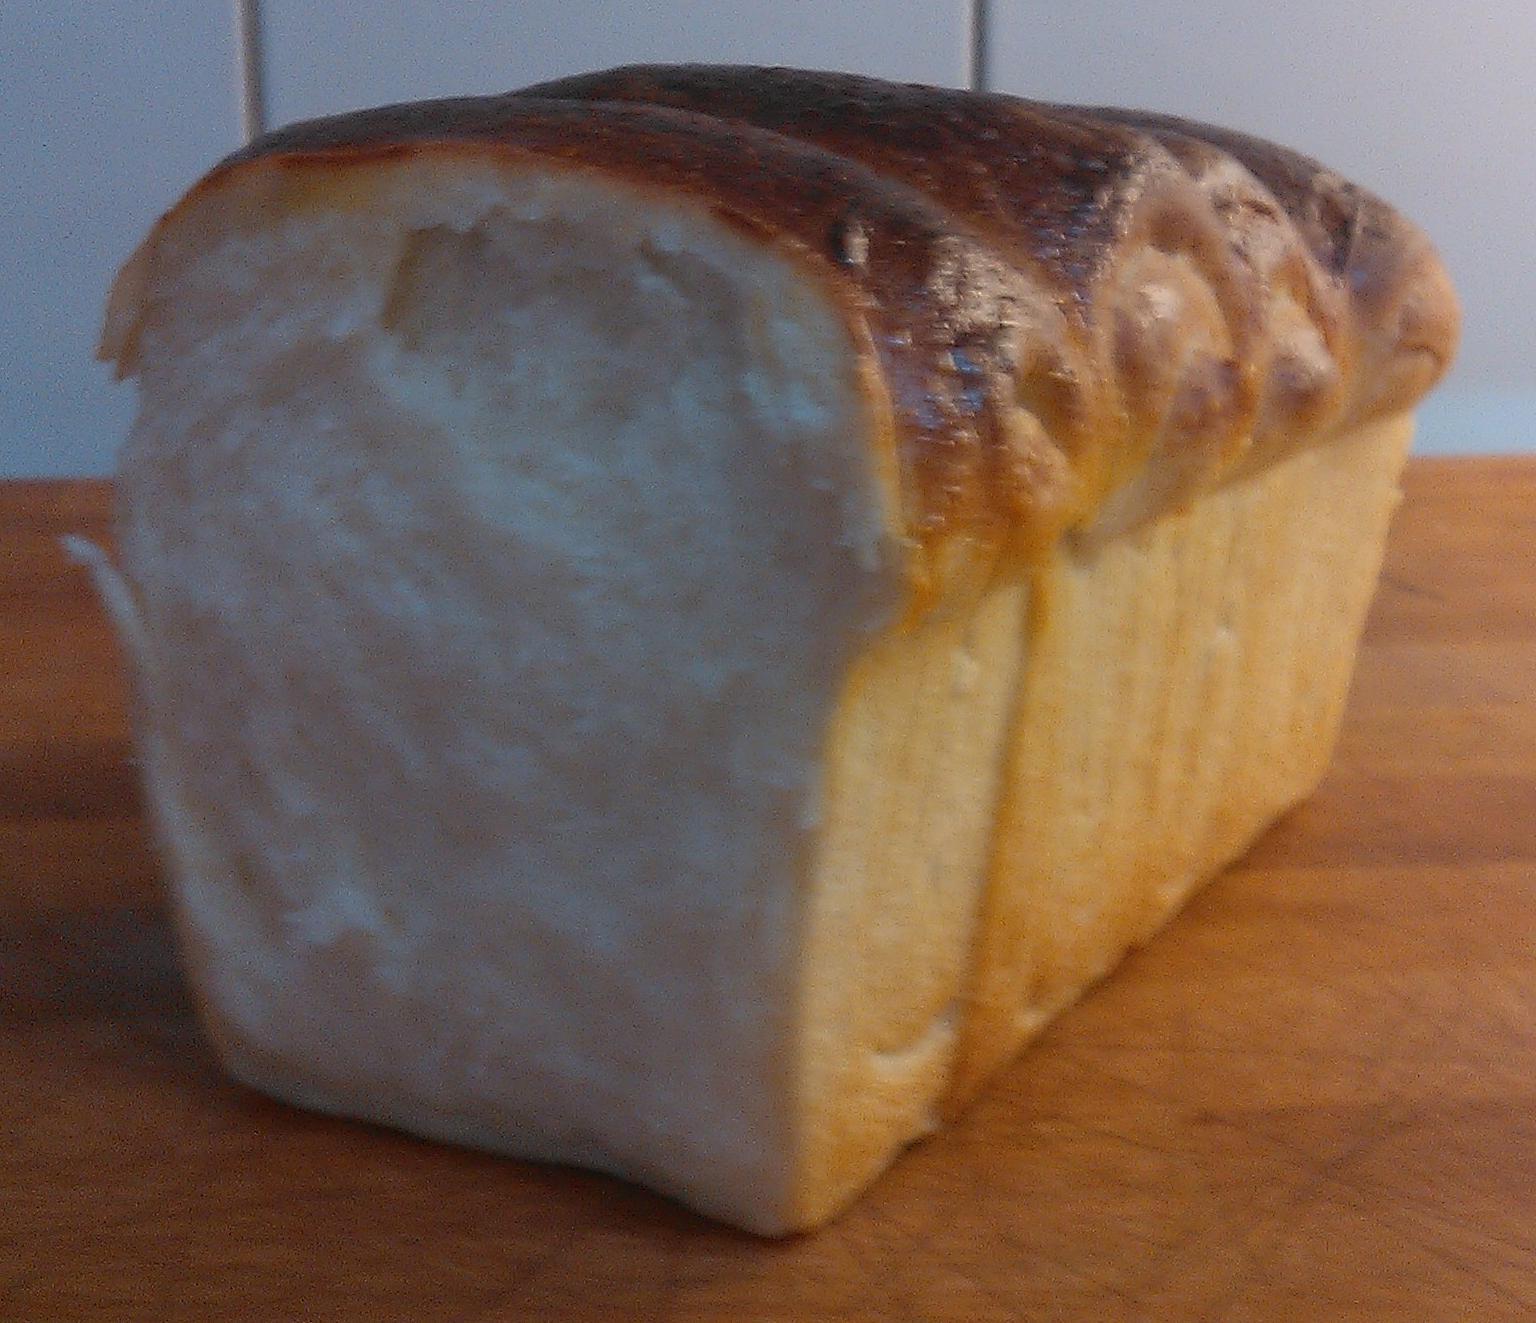 img/milkbread/crumb.jpg